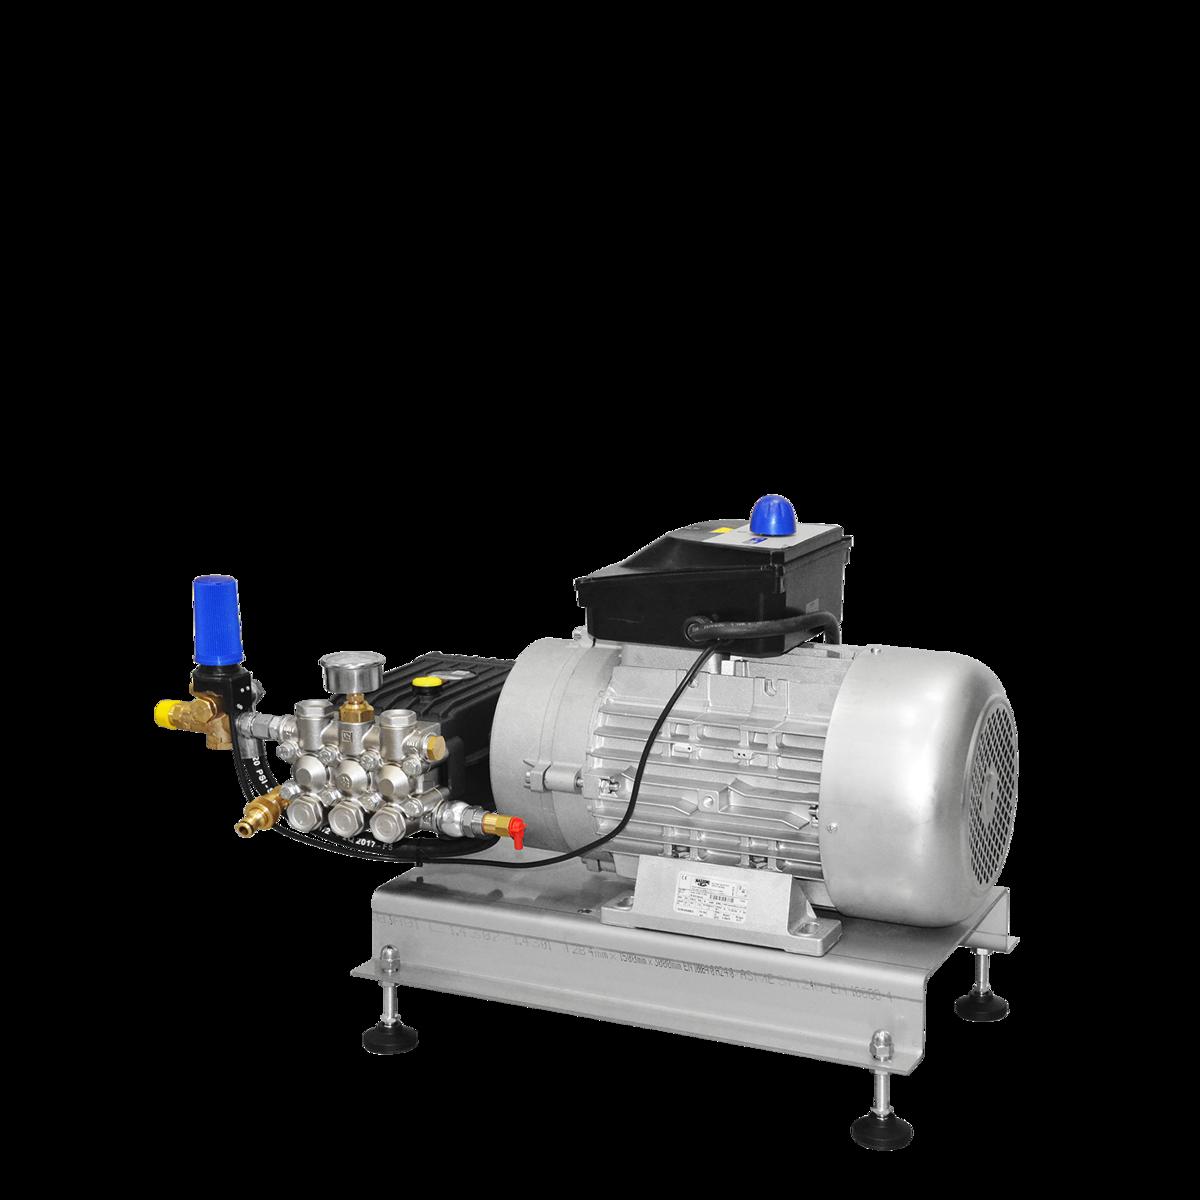 Motor/pump units